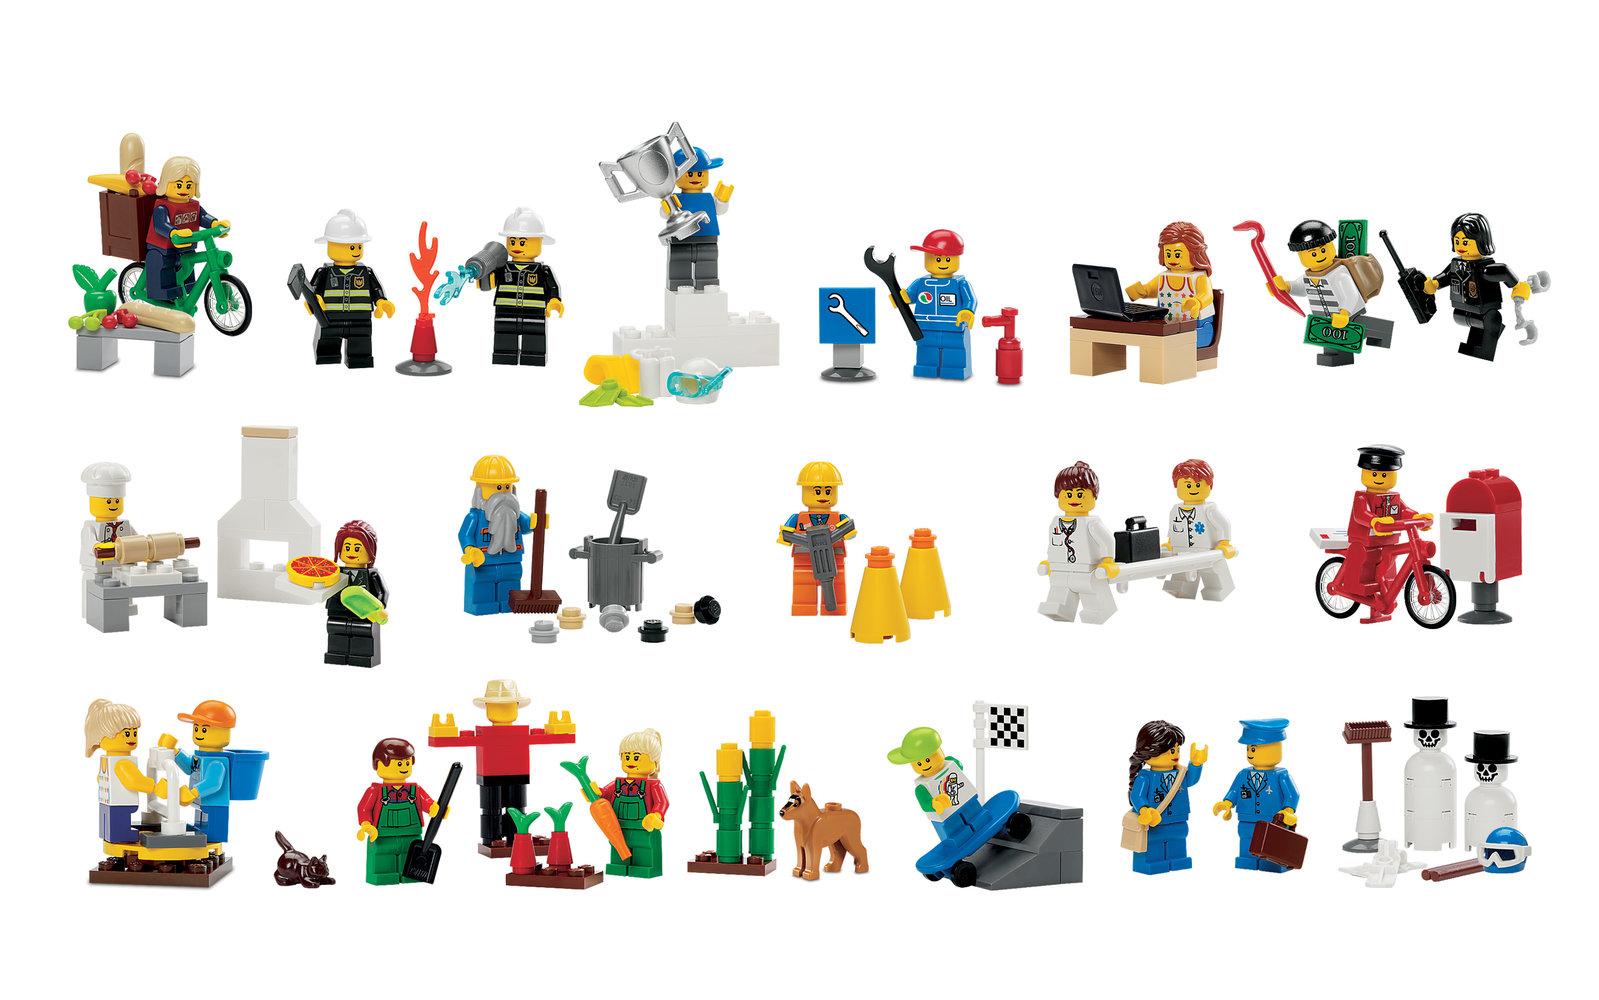 Community Minifigures